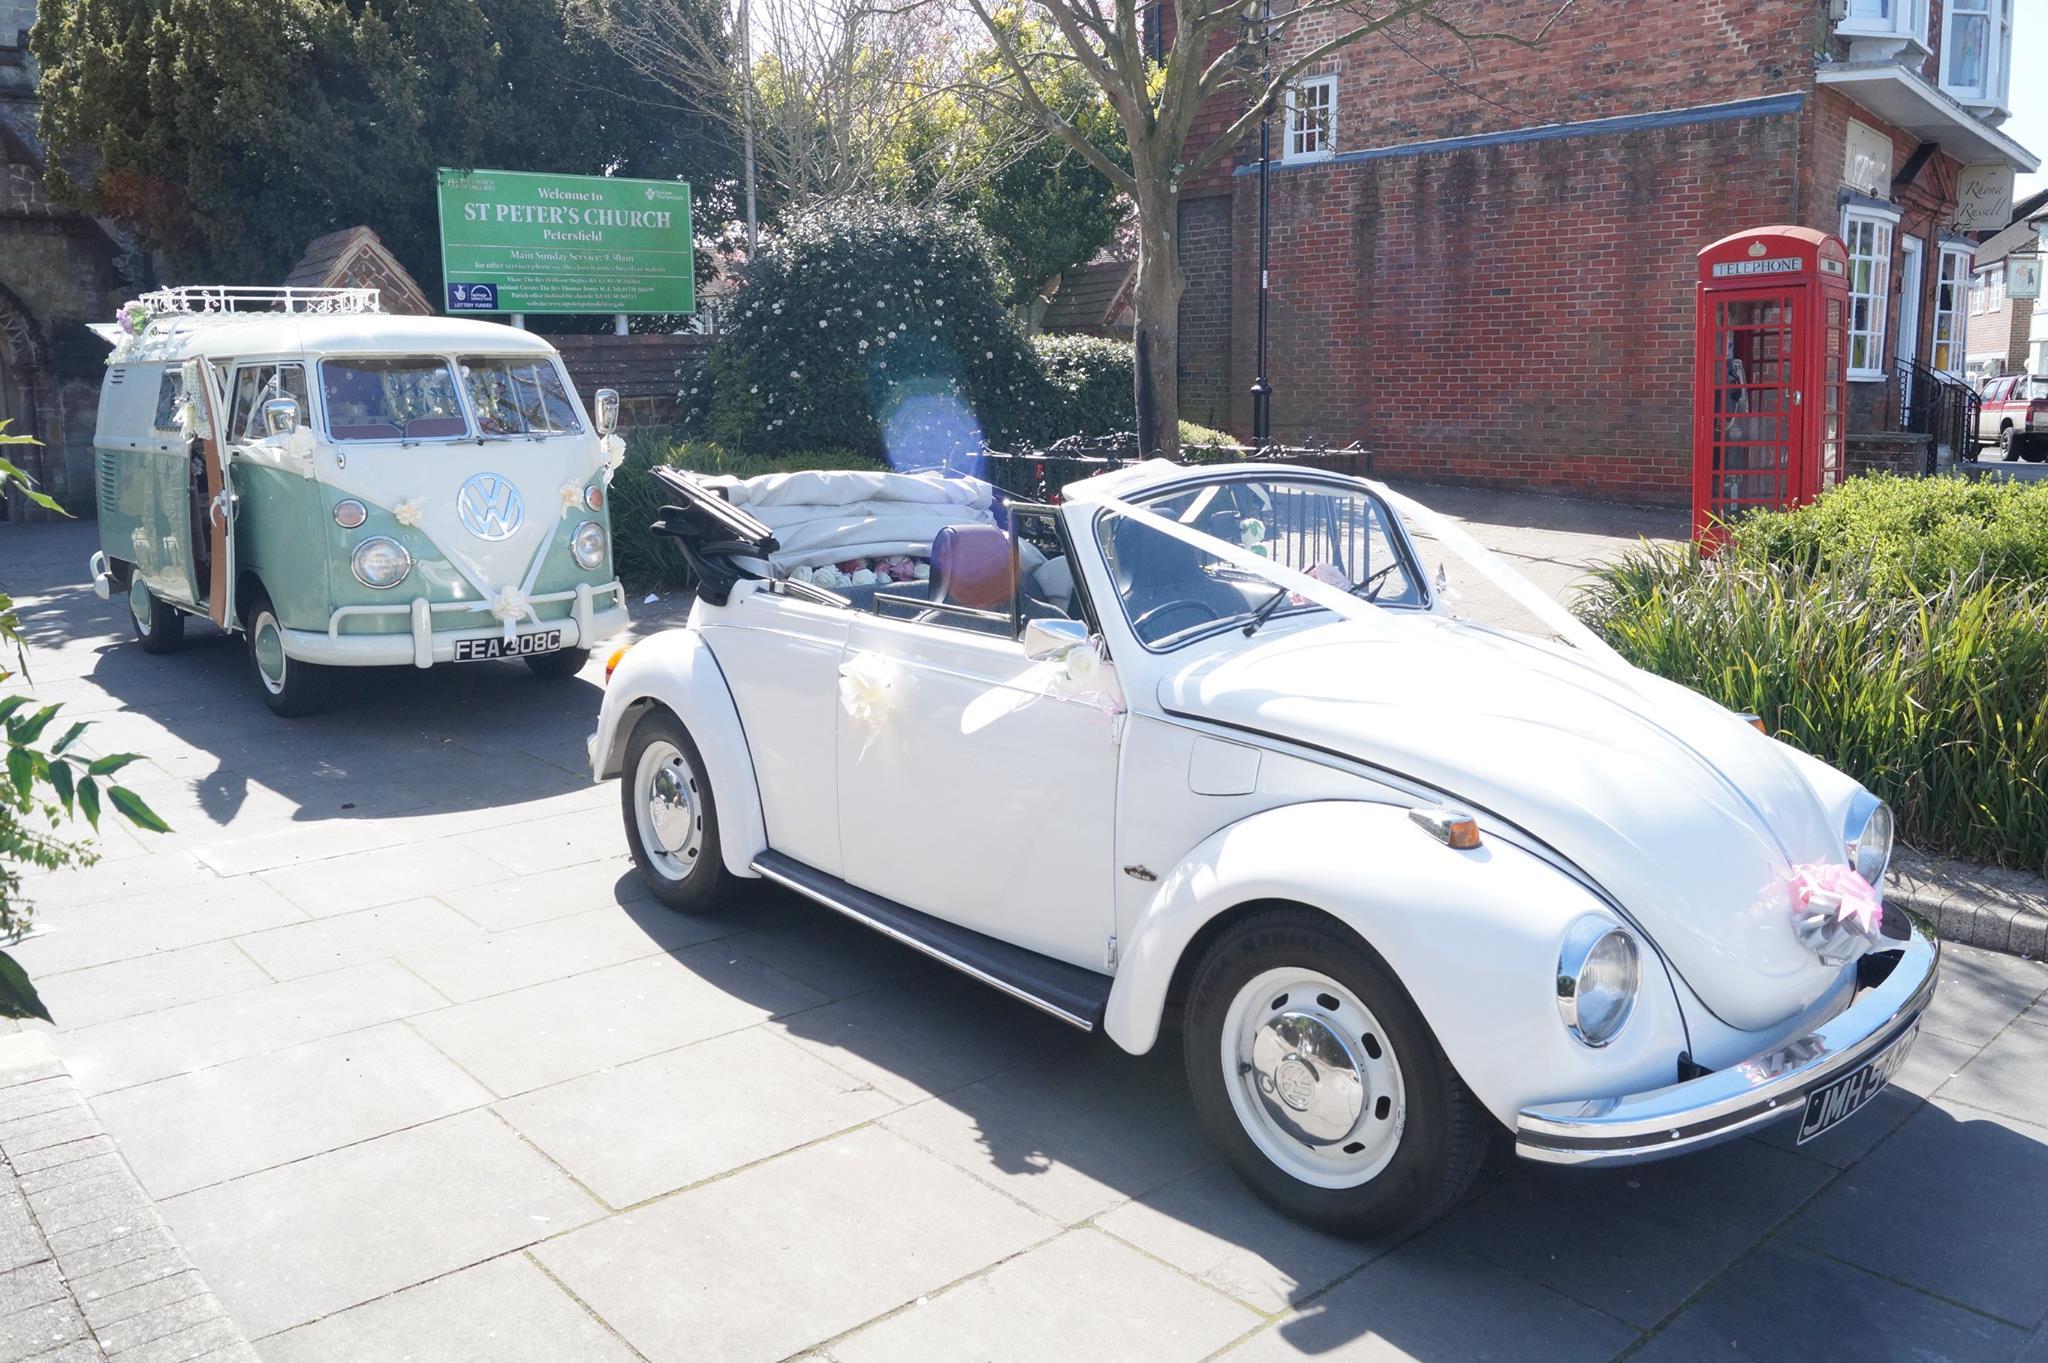 White vw beetle weddings white vw beetle hampshire wedding junglespirit Images